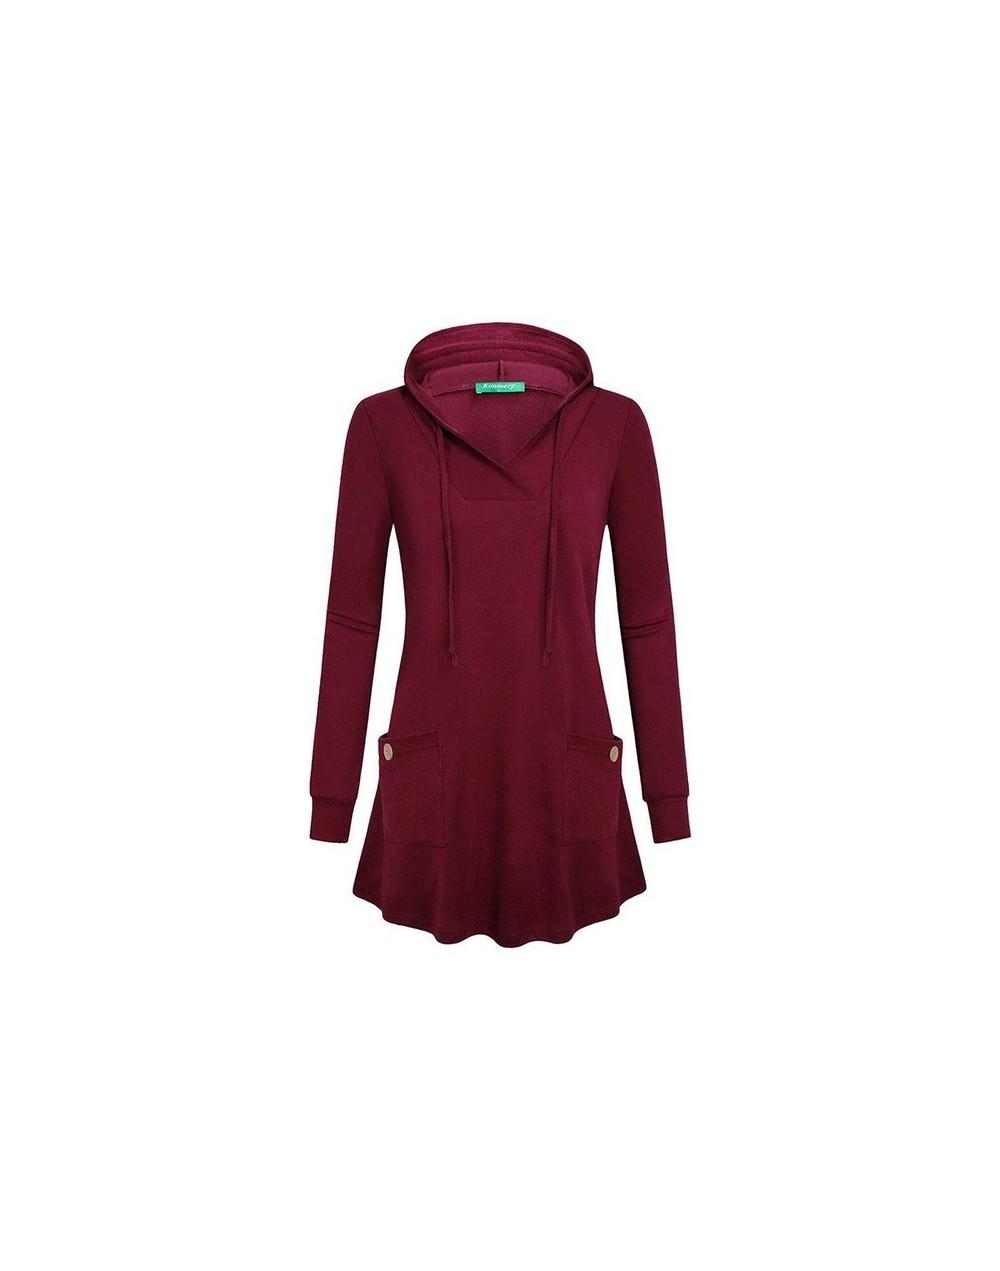 Autumn 2019 Casual Plus Size Black Gothic Streetwear Women Hoodies Slim Hooded Plain Pocket Tops Red Female Fashion Sweatshi...